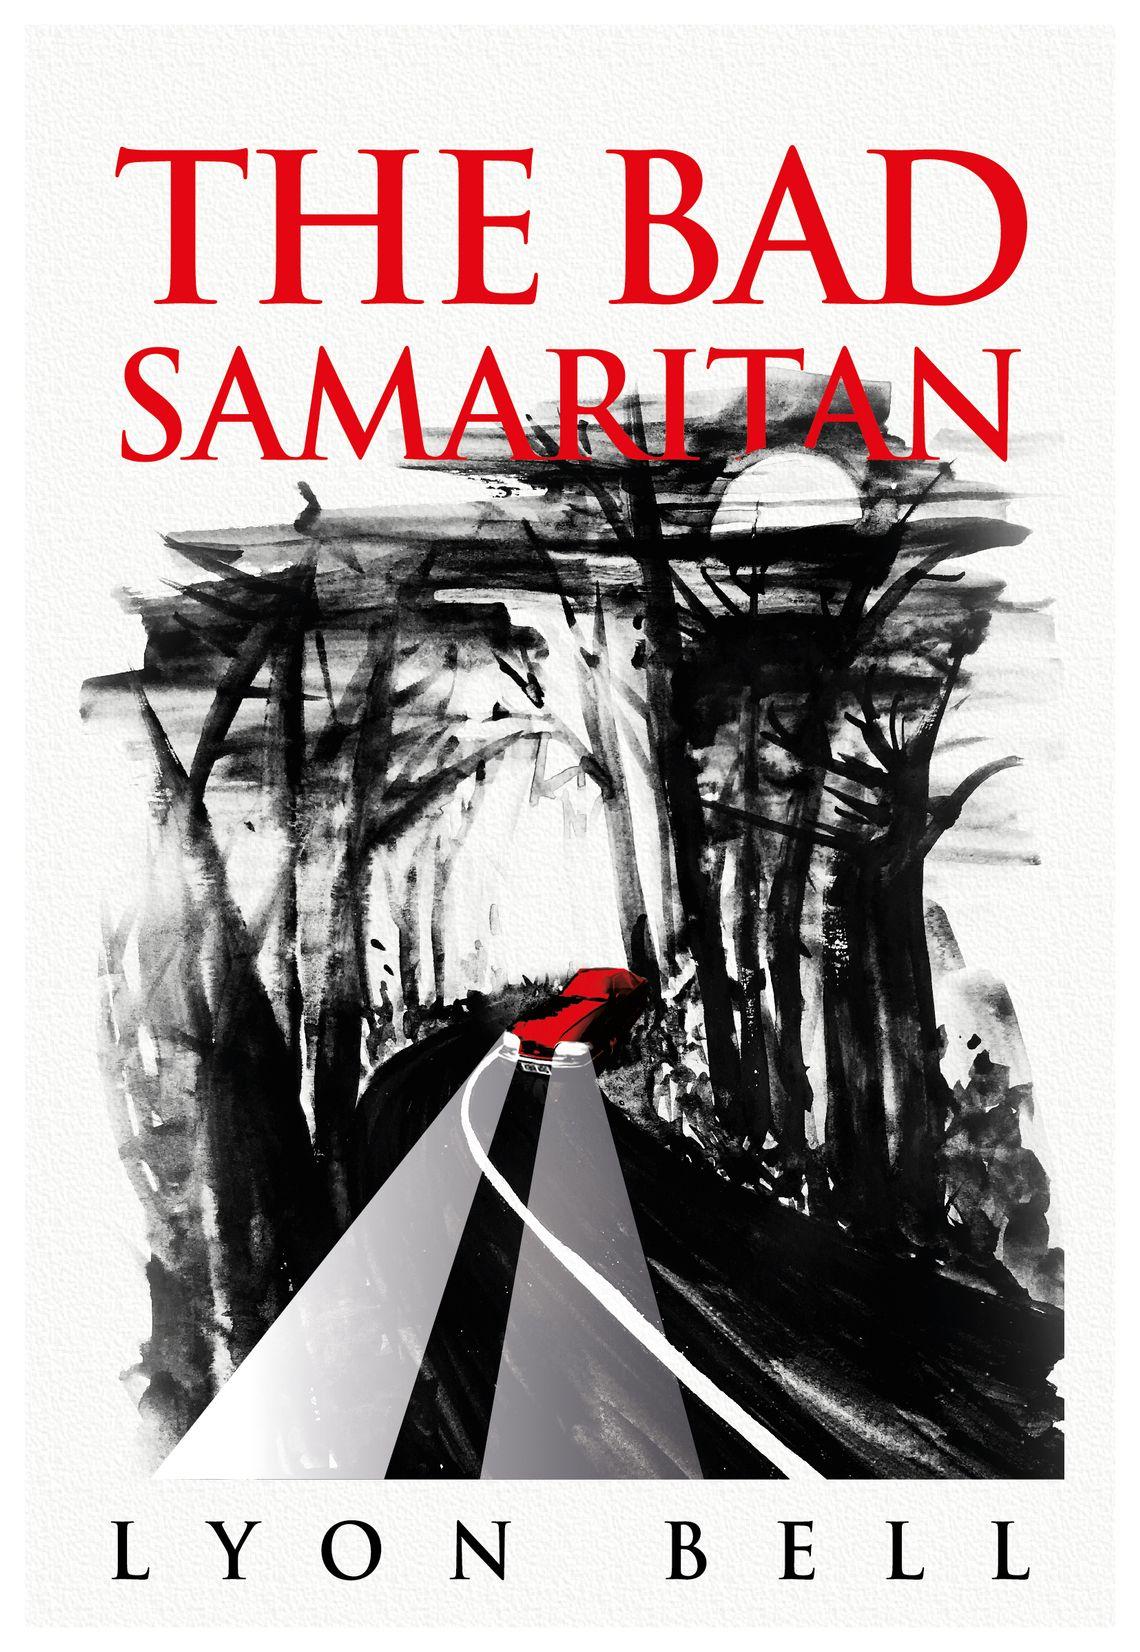 New book: 'The Bad Samaritan' by Lyon Bell